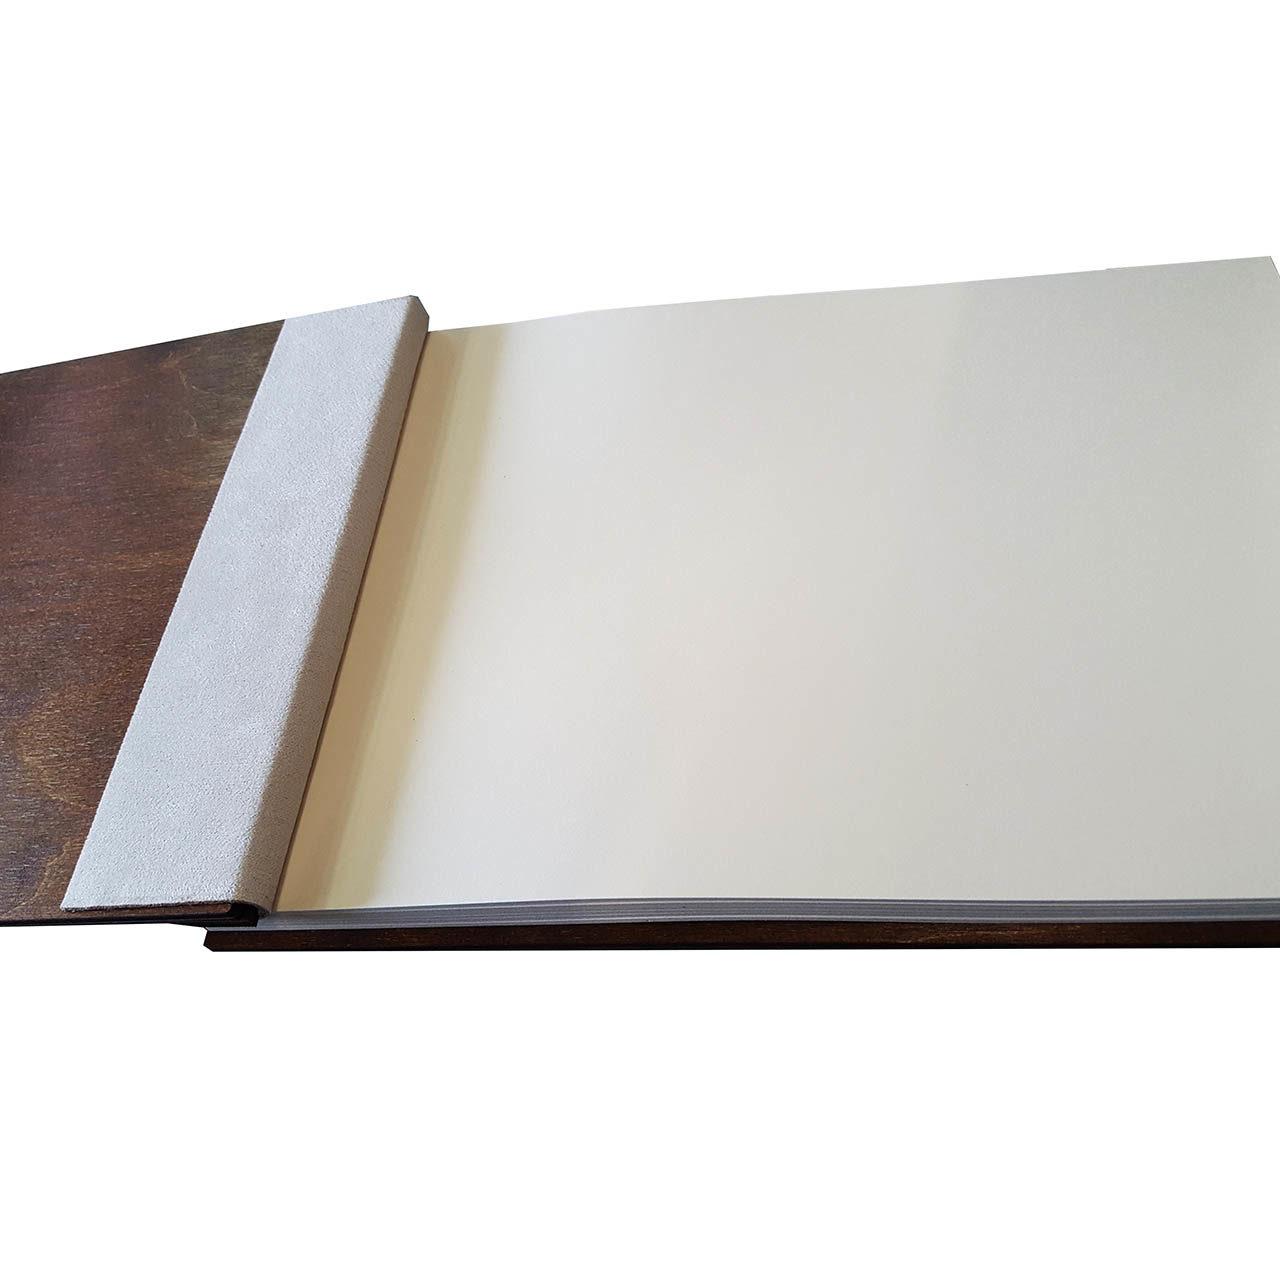 "Holz-Gästebuch ""Ja"" - Personalisiert"